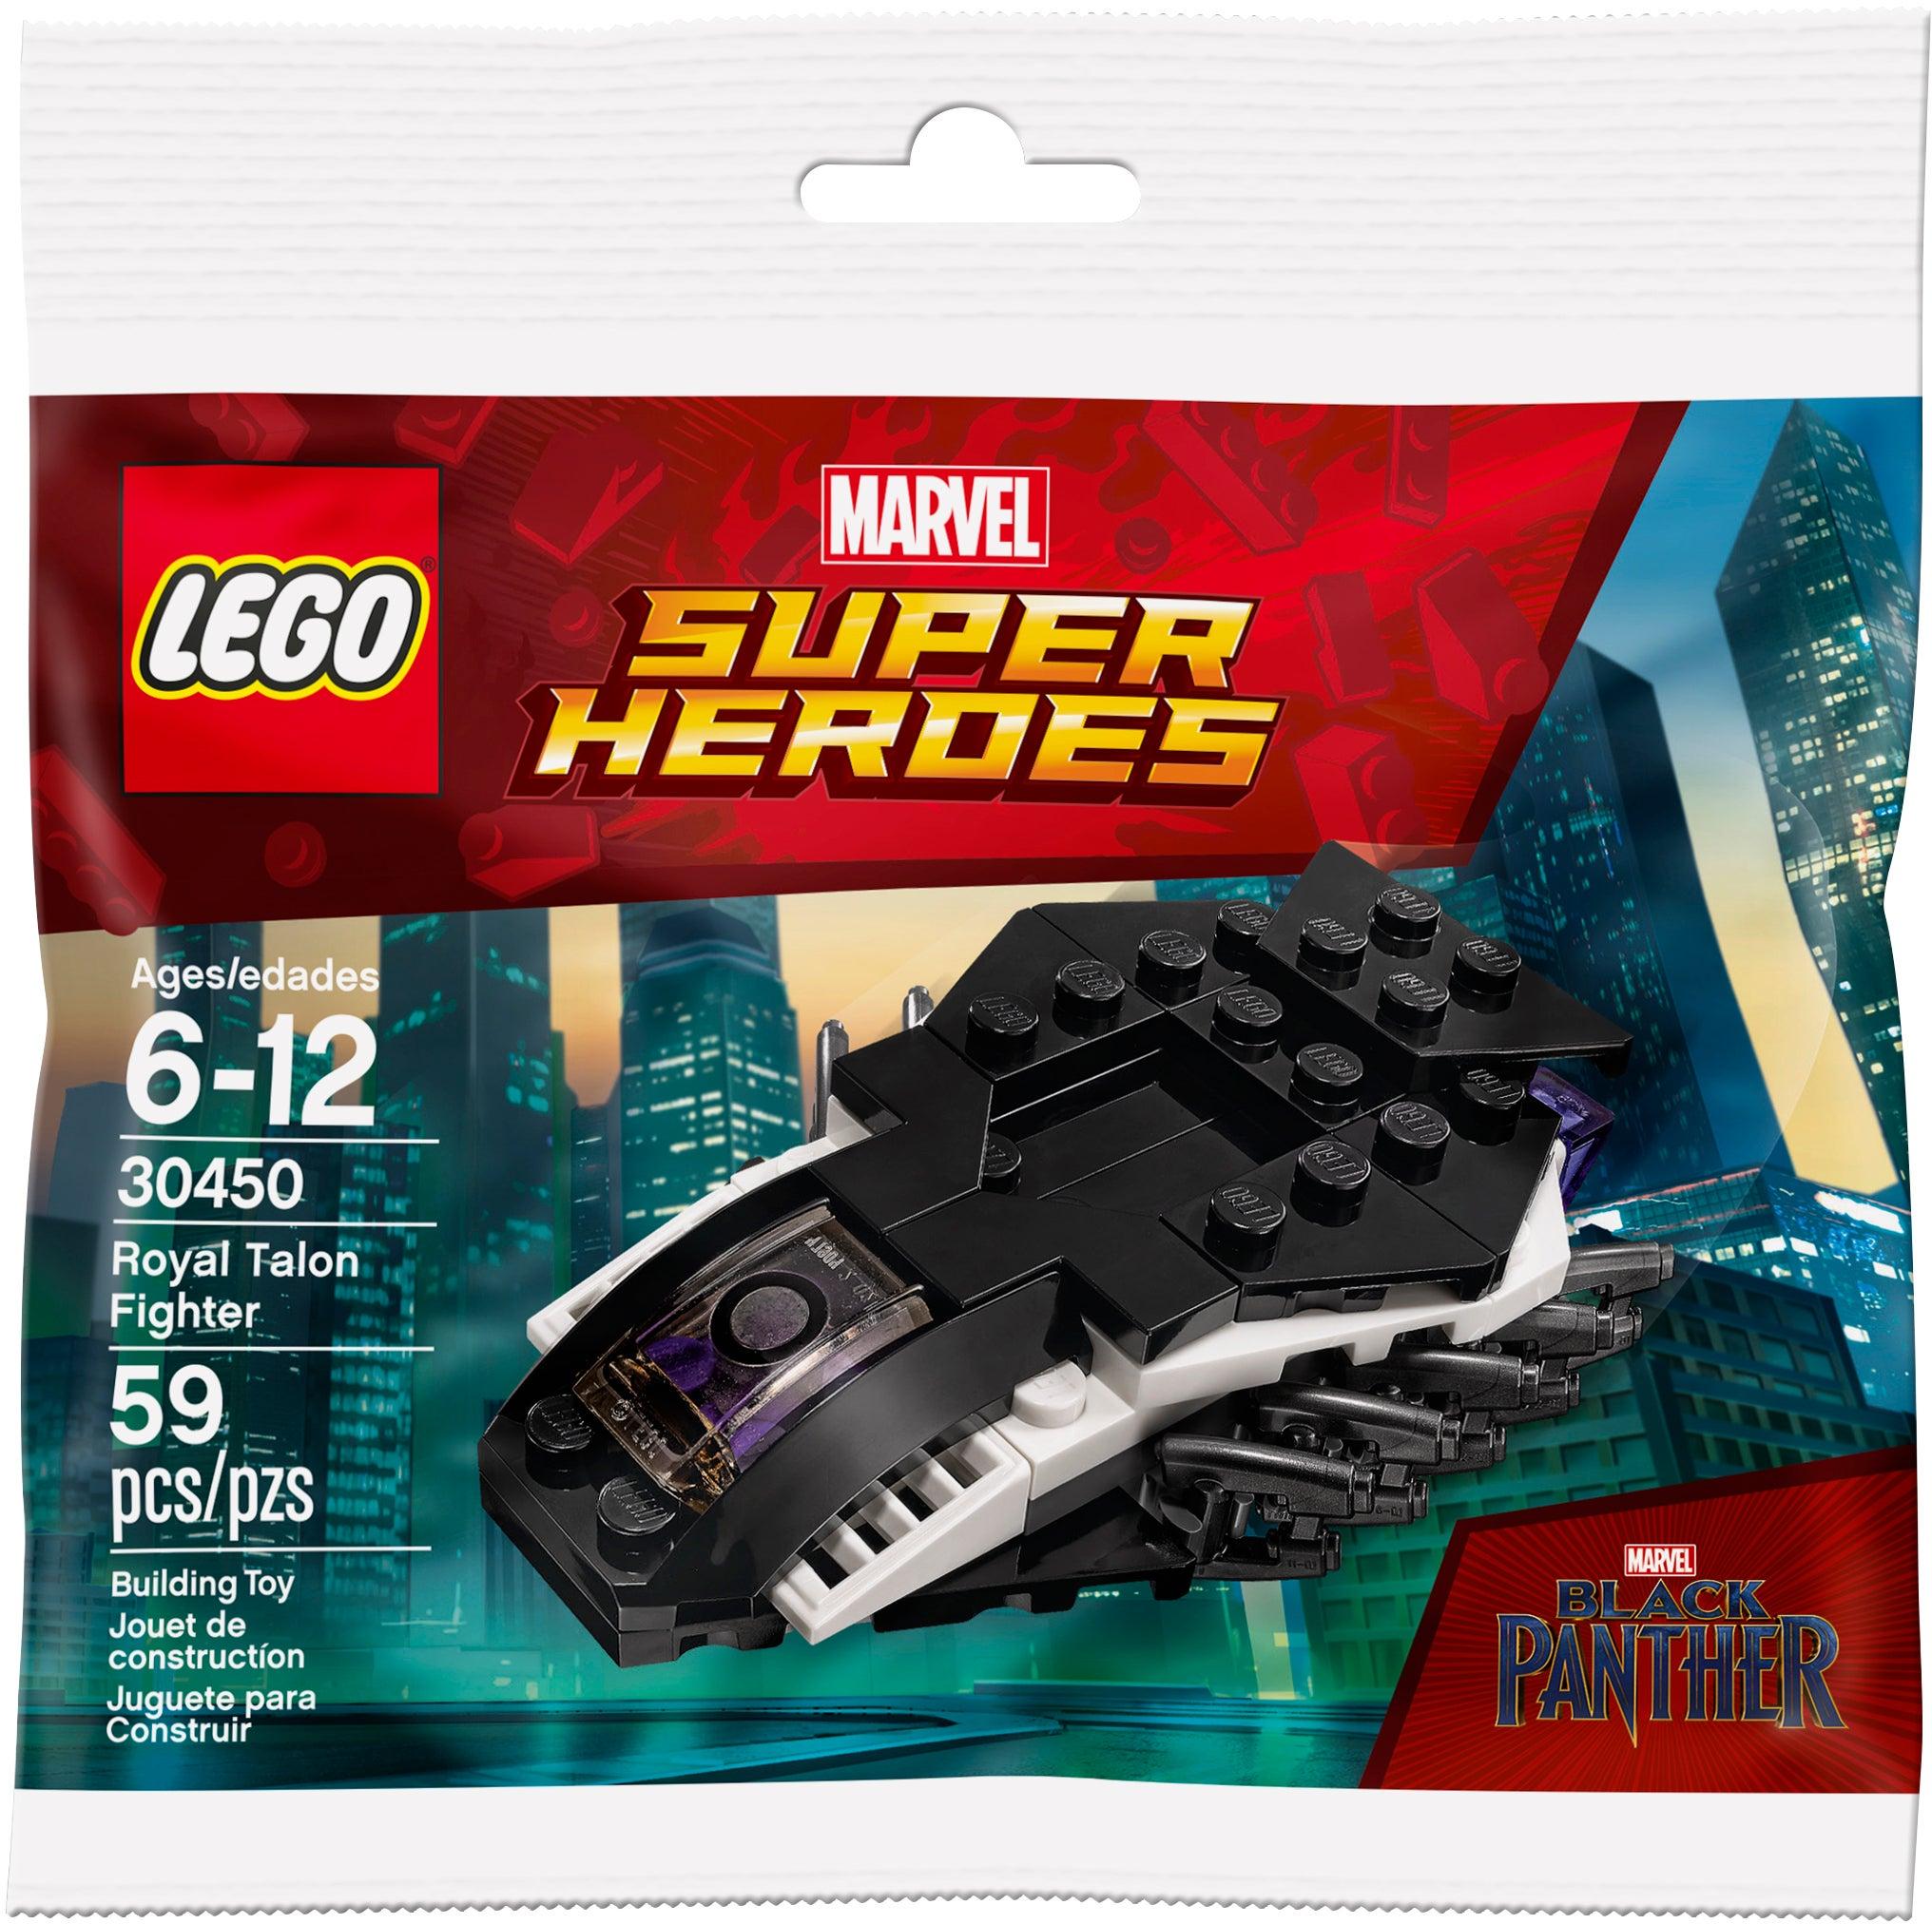 Lego Black Panther Polybag Royal Talon Fighter 30450 New